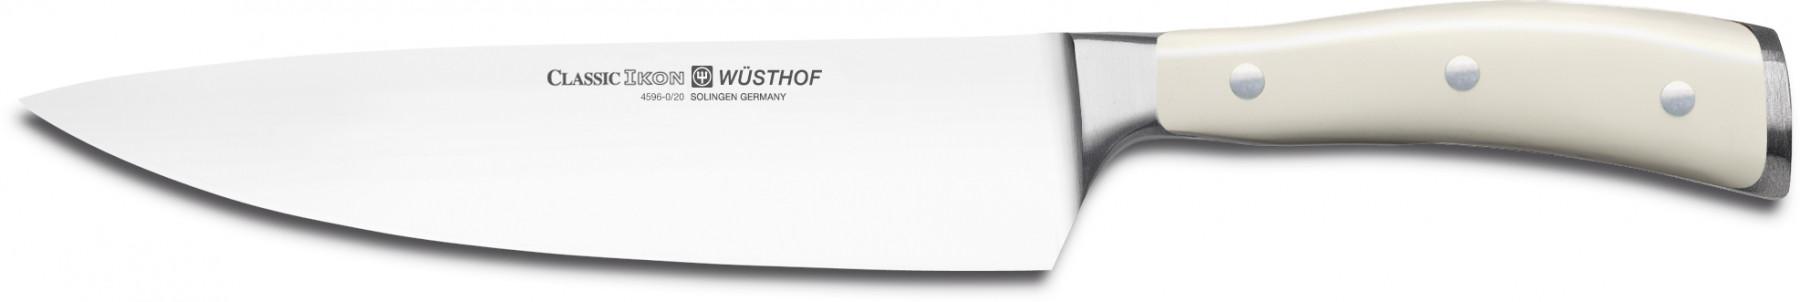 Wüsthof Dreizack Classic Ikon Creme Messerblock 10tlg. Kochmesser